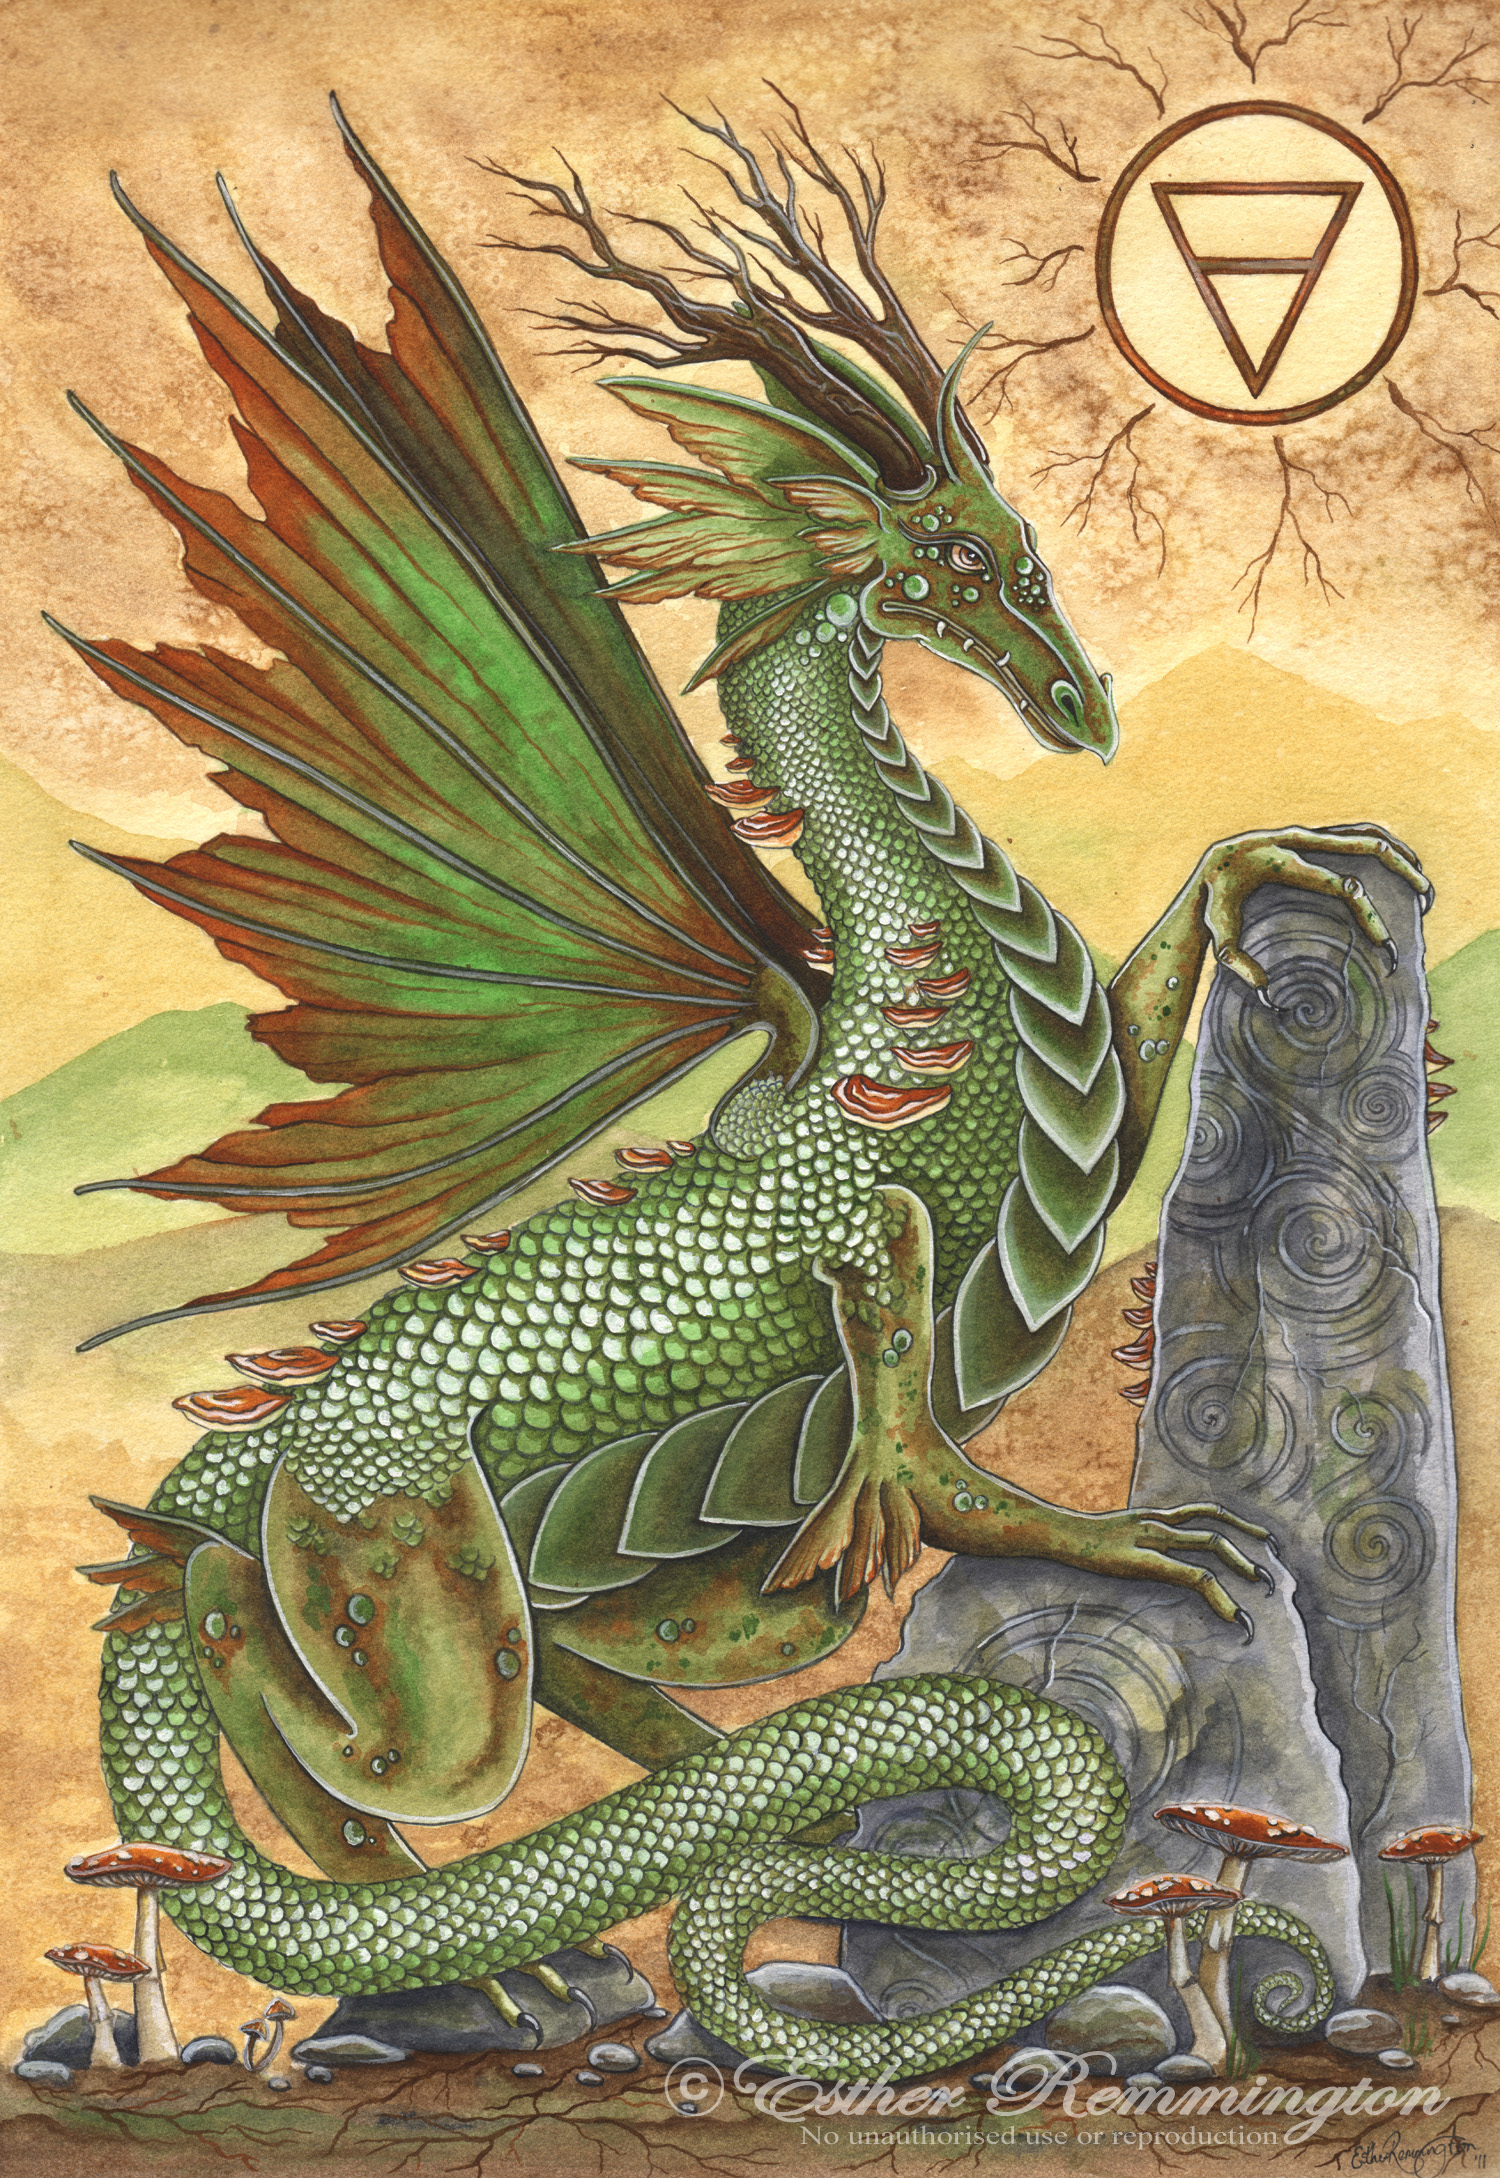 Earth Dragon - 2011